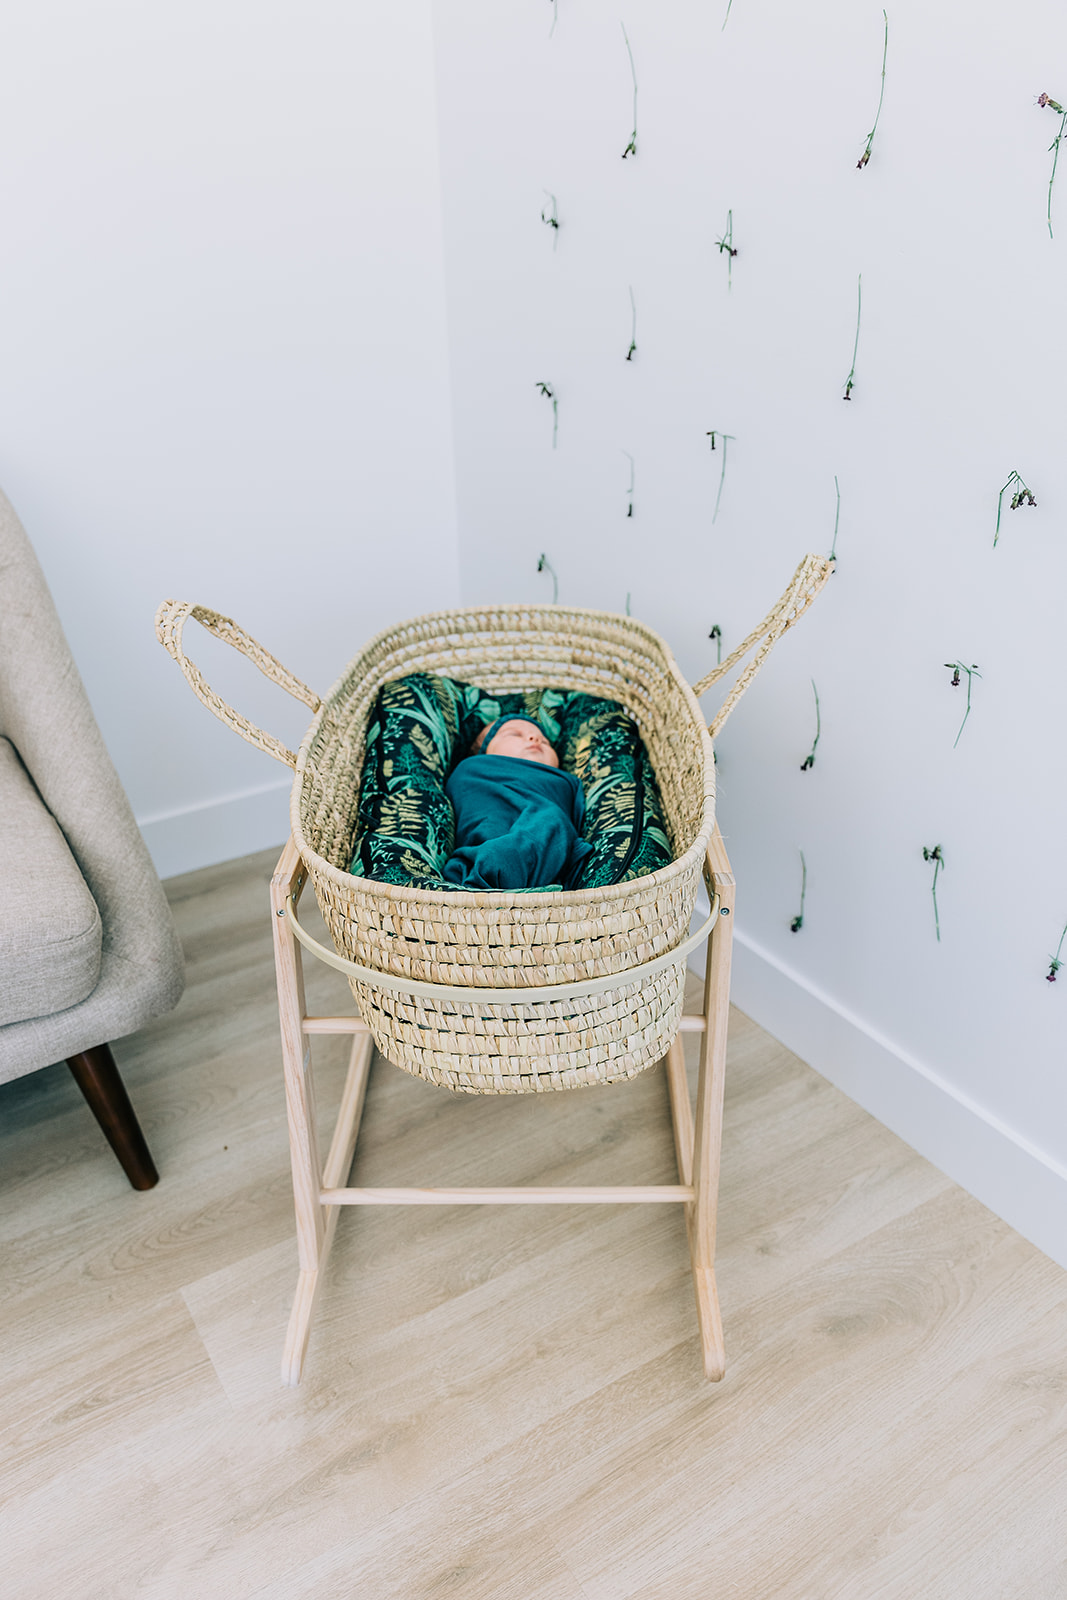 Darling newborn studio photo shoot for baby girl Leighton in a bassinet in Logan, Utah by Bella Alder Photography in Blush Door Studio | #bellaalderphoto #newbornphotographer #utahnewbornphotos #babygirlnewborn #babygirl #blushdoorstudio #newbornsession #utahbabies